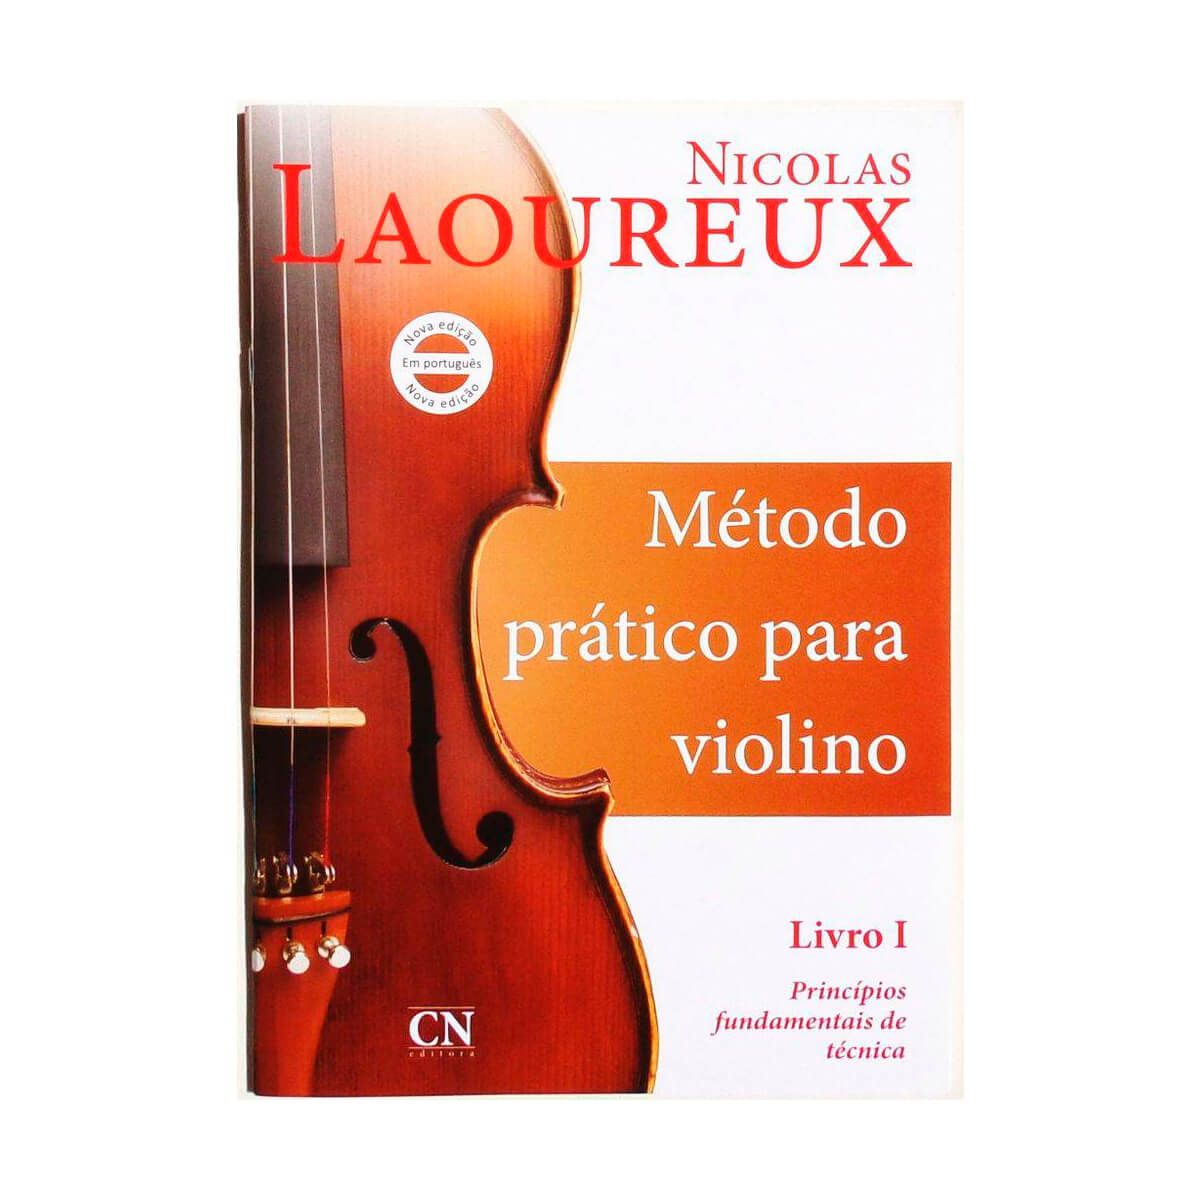 Método - Nicolas Laoureux - Violino - Volume 1